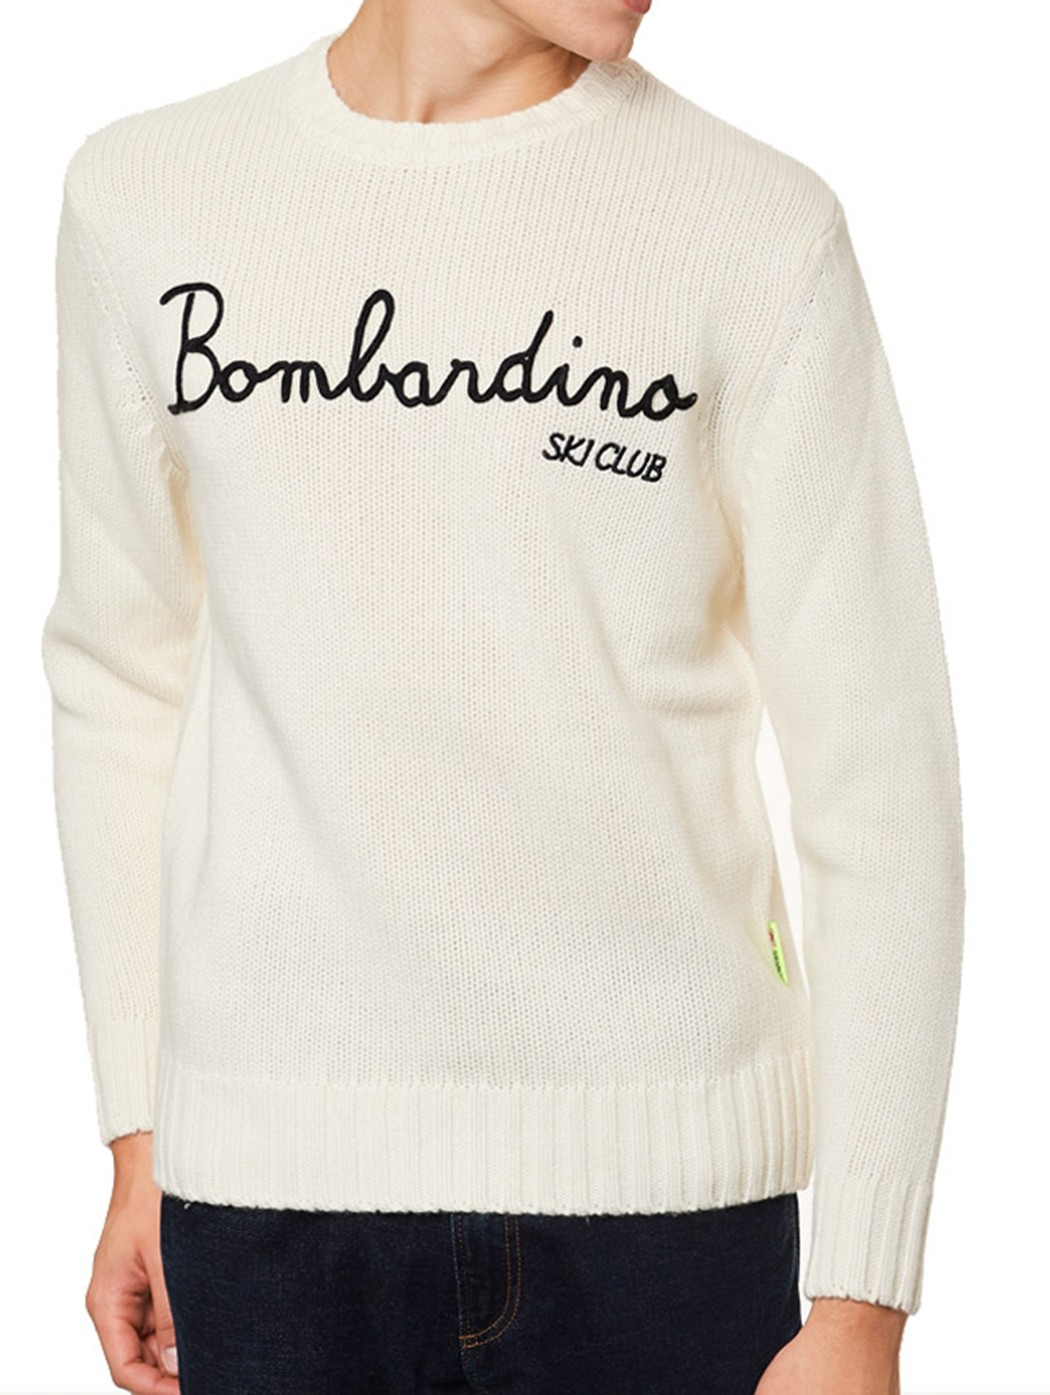 BOMBARDINO EMB SKI CLUB SAINTBARTH MC2 BOMD001EMSK 10